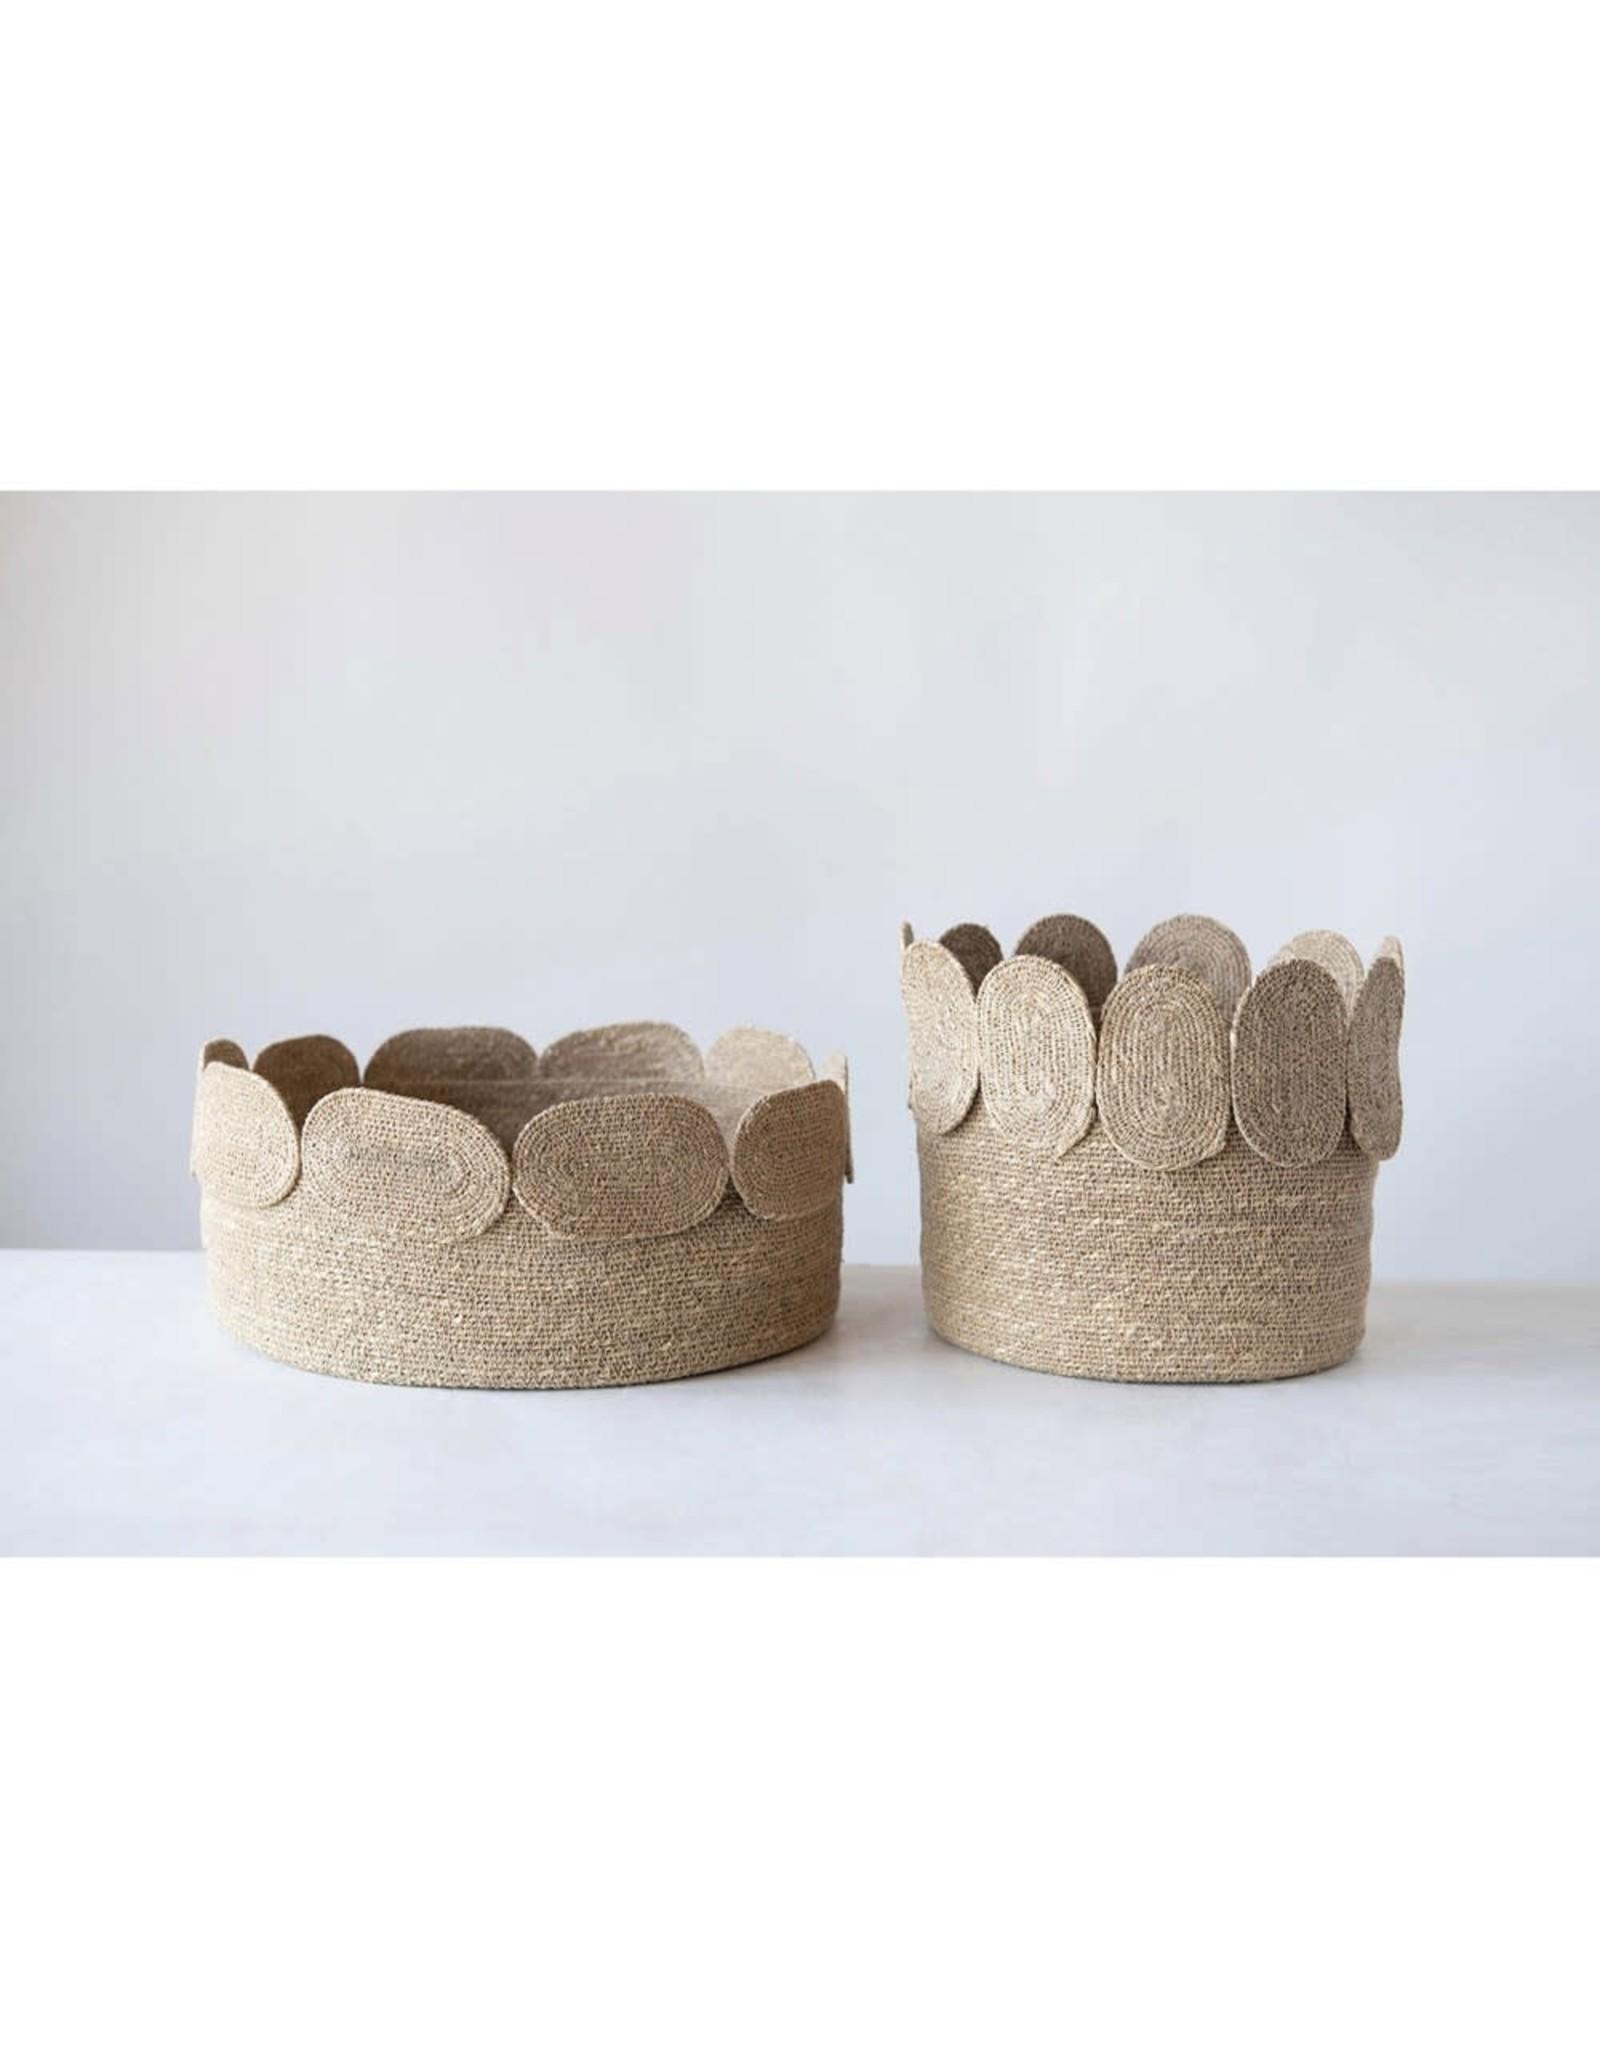 Oak + Arrow Interiors Seagrass Baskets - Tall